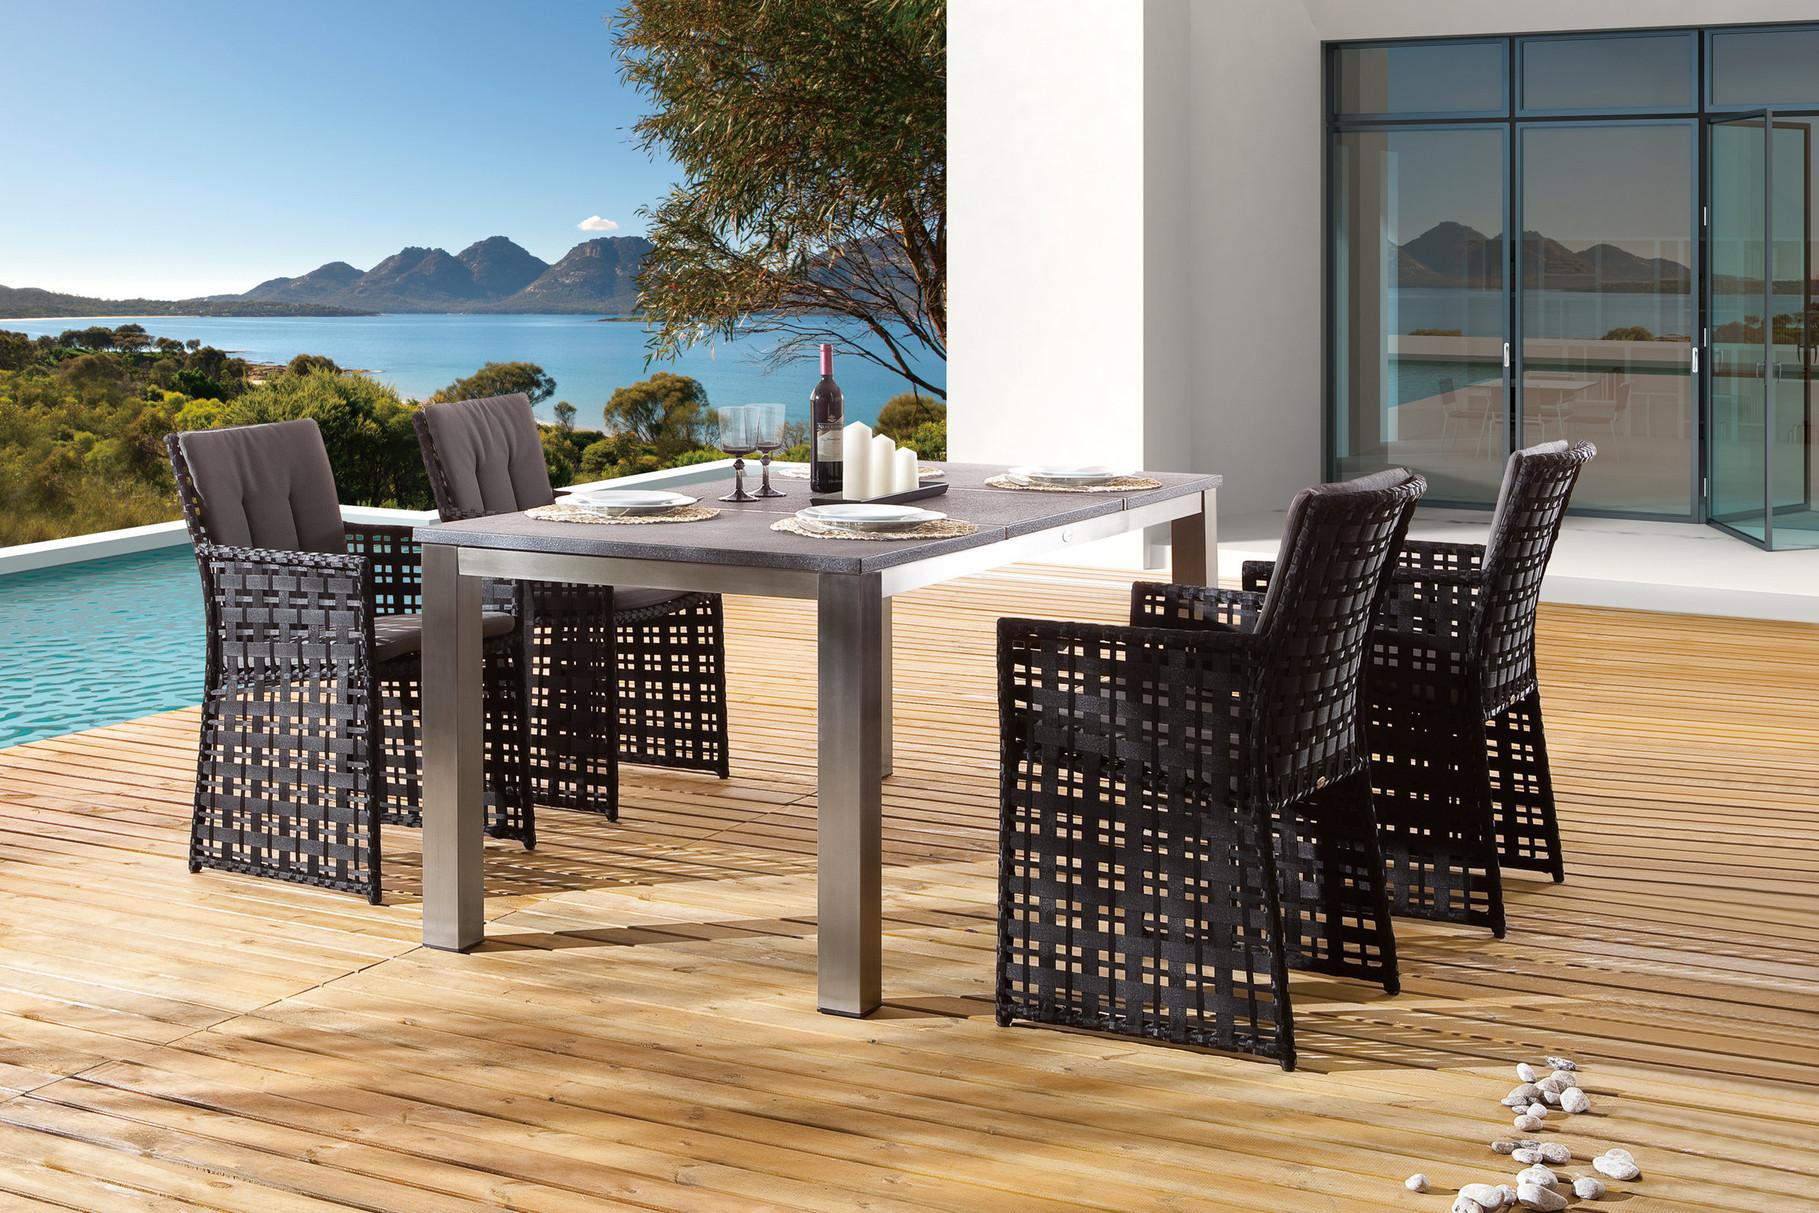 Serie Barcello Schwarz | Tisch Square Edelstahl Granit